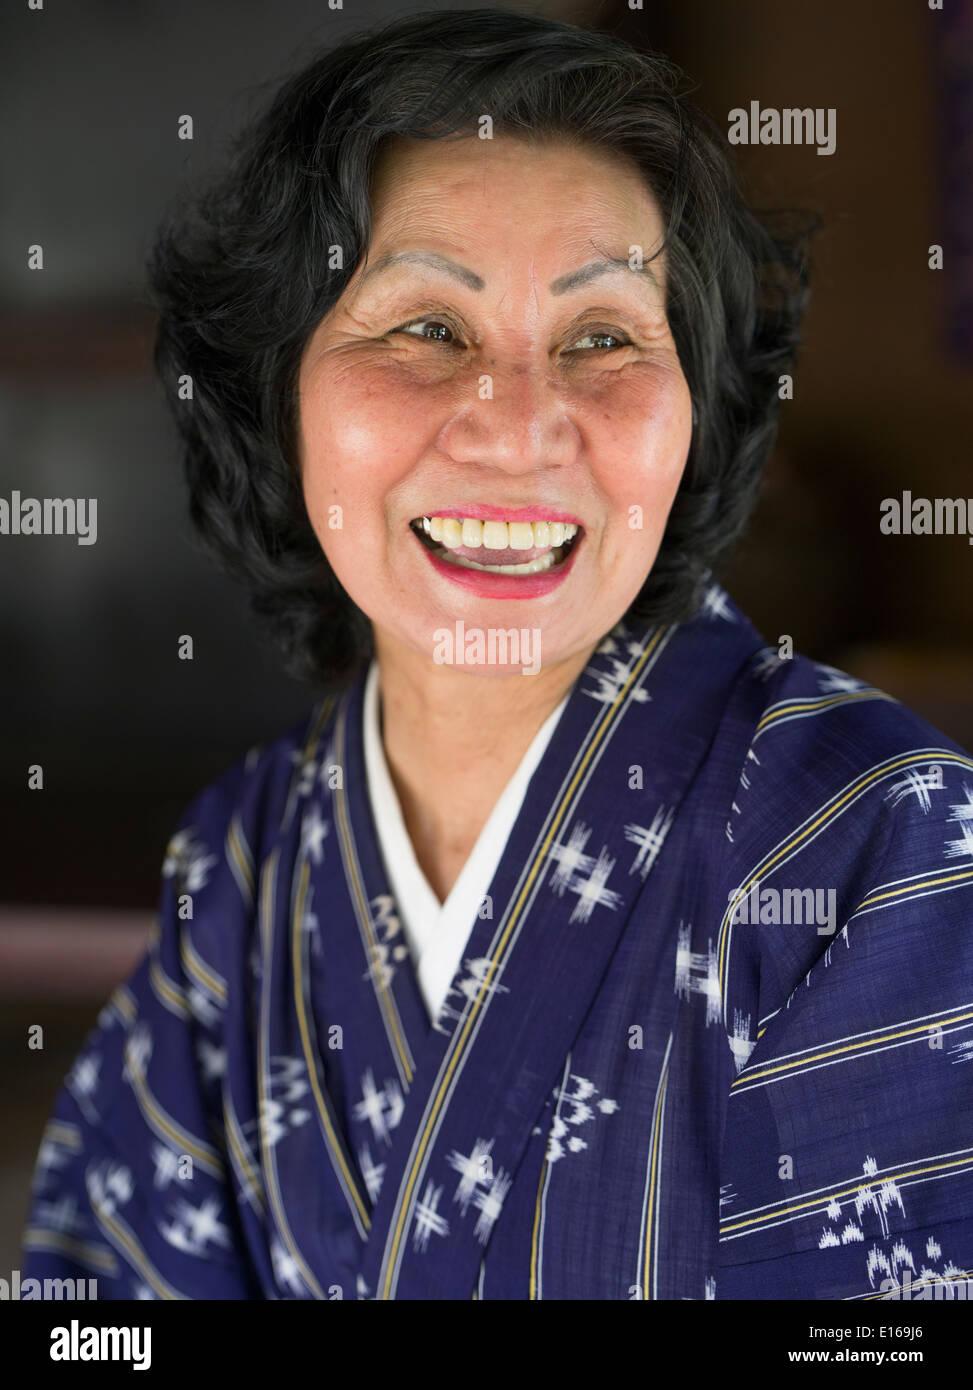 Bella di Okinawa anziana donna che indossa yukuata e sorridente. Ryukyu Mura, Okinawa, in Giappone Immagini Stock